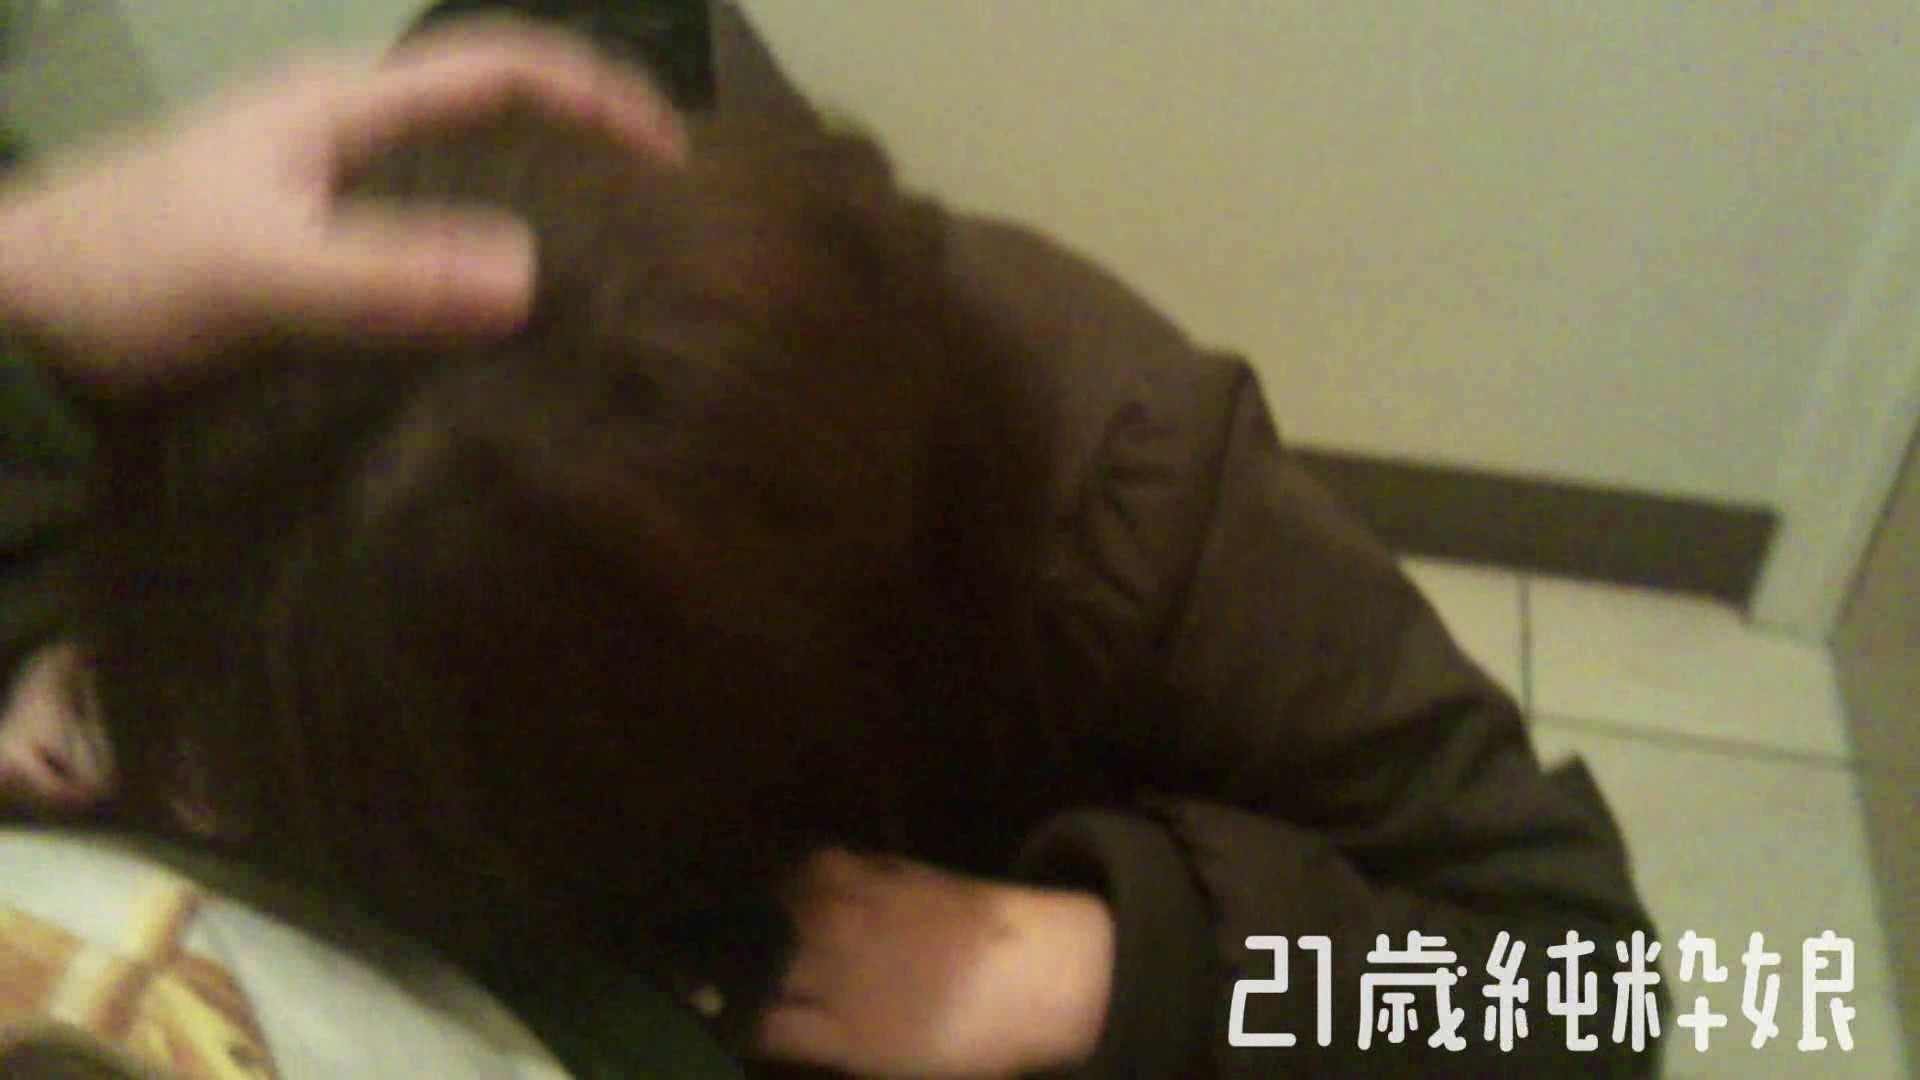 Gカップ21歳純粋嬢第2弾Vol.5 美女OL  78連発 40